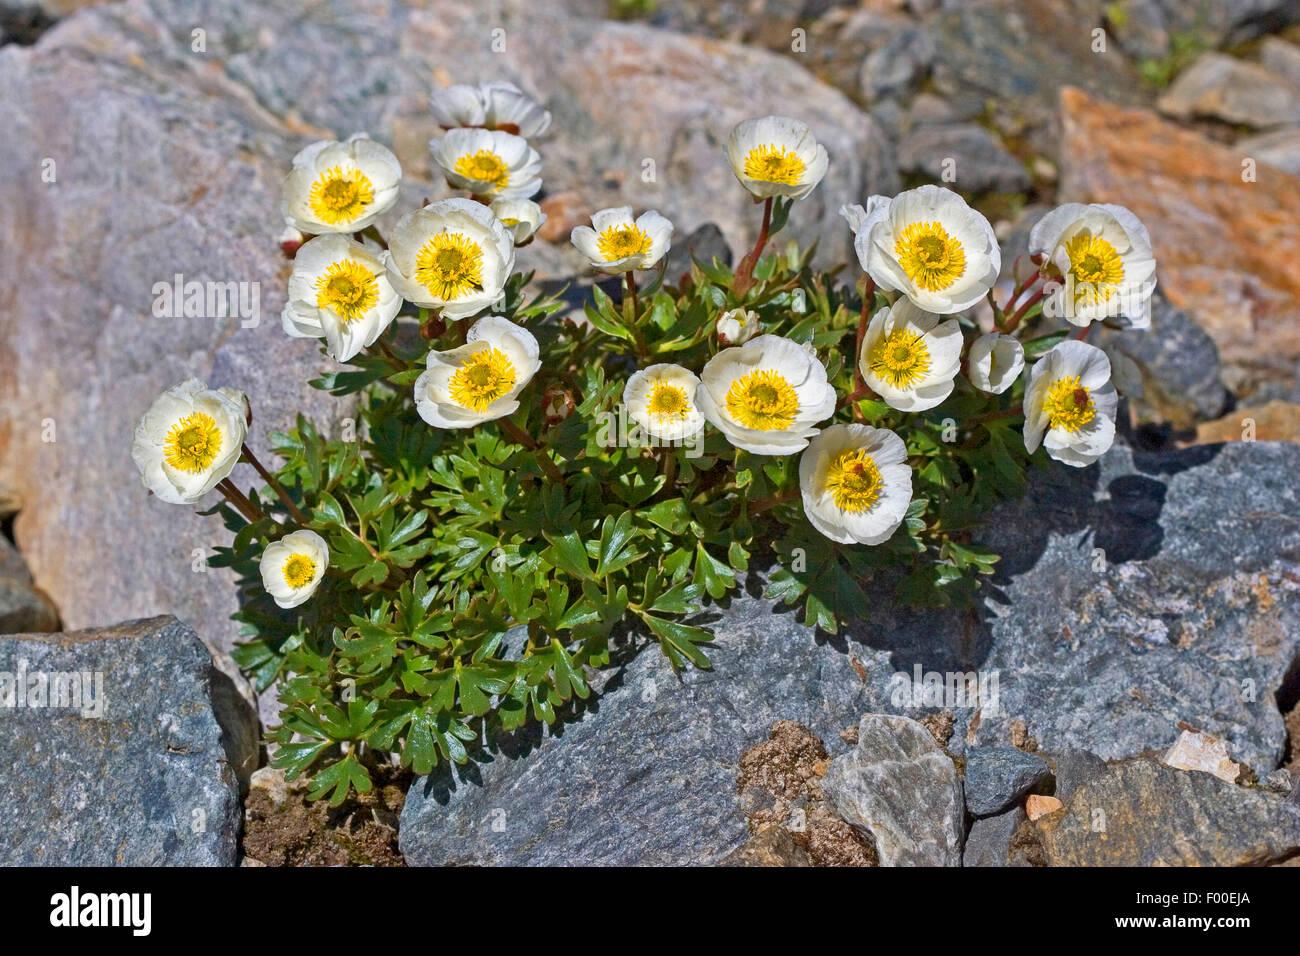 glacier crowfoot (Ranunculus glacialis), blooming between rocks, Austria Stock Photo